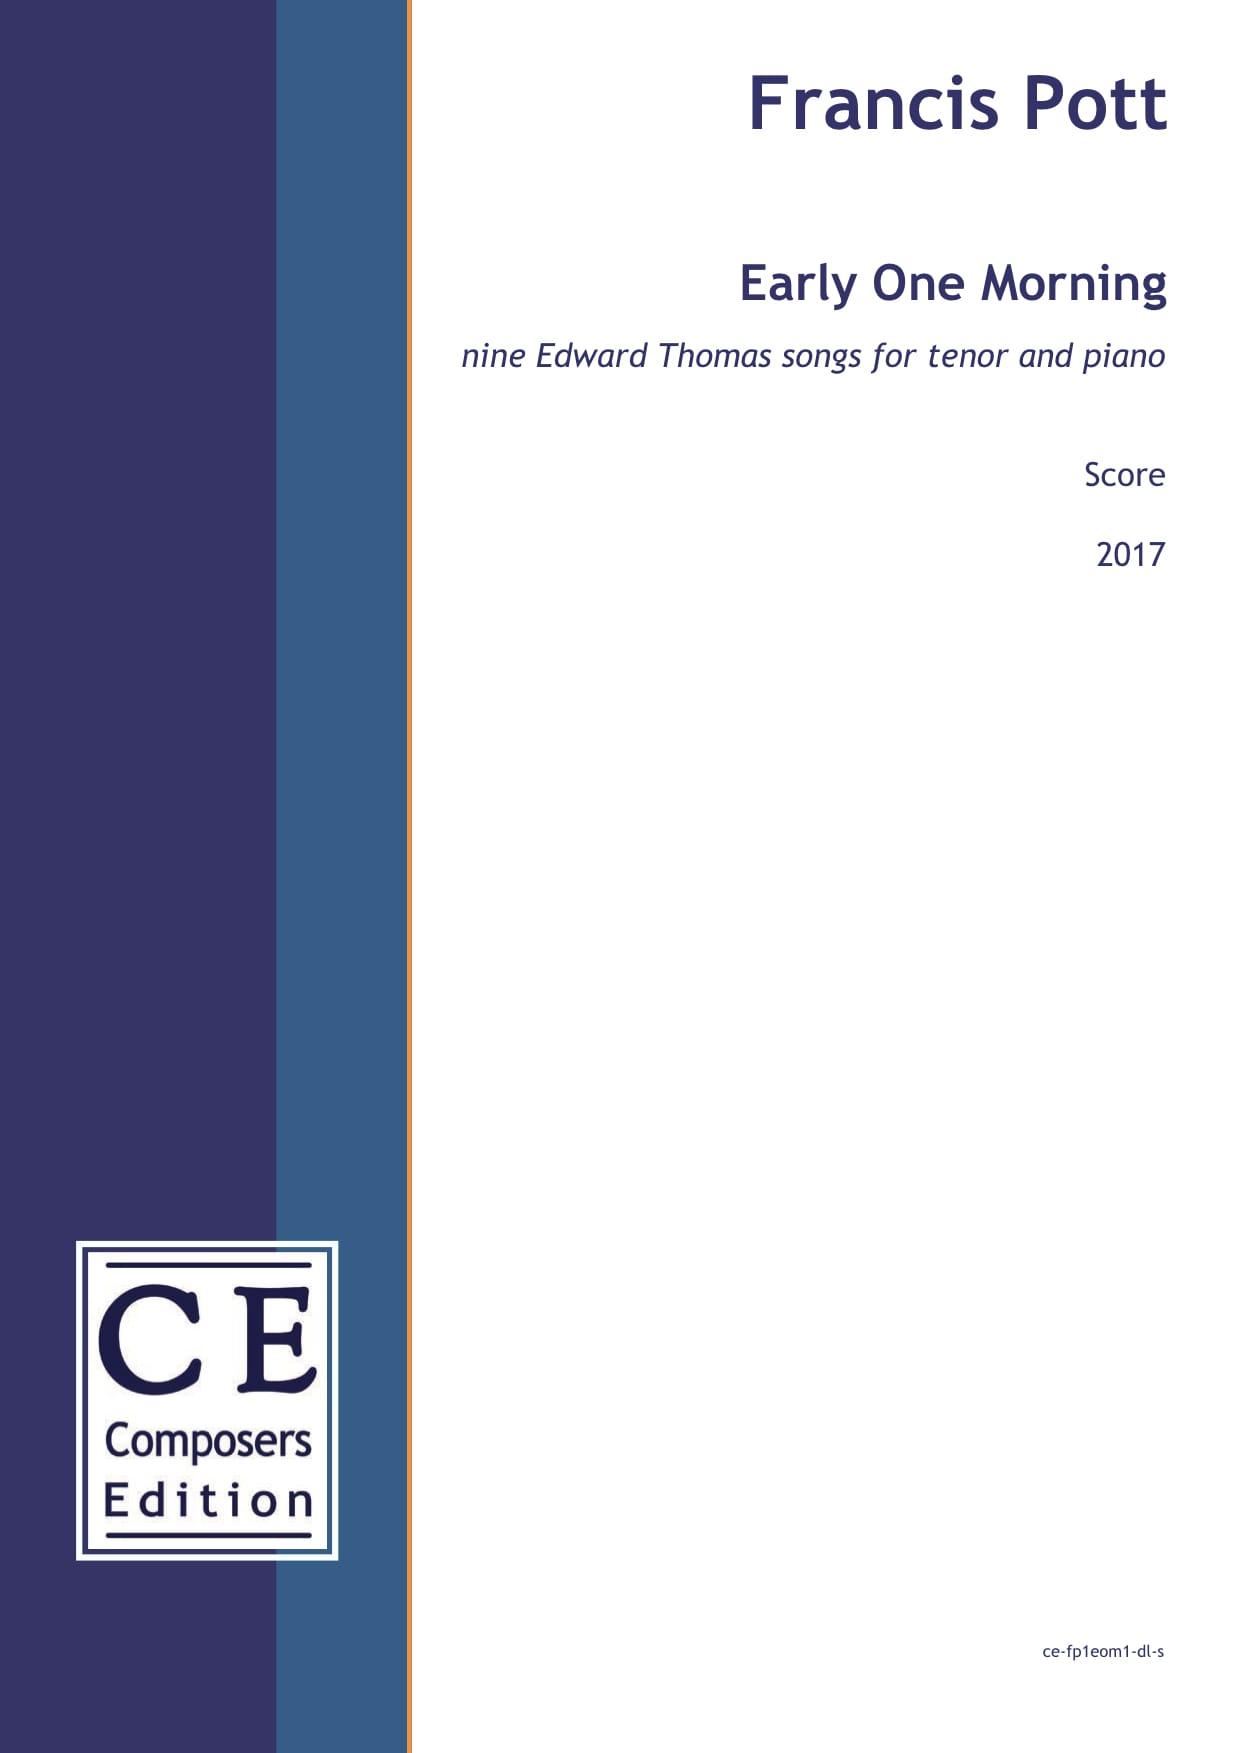 Francis Pott: Early One Morning nine Edward Thomas songs for tenor and piano